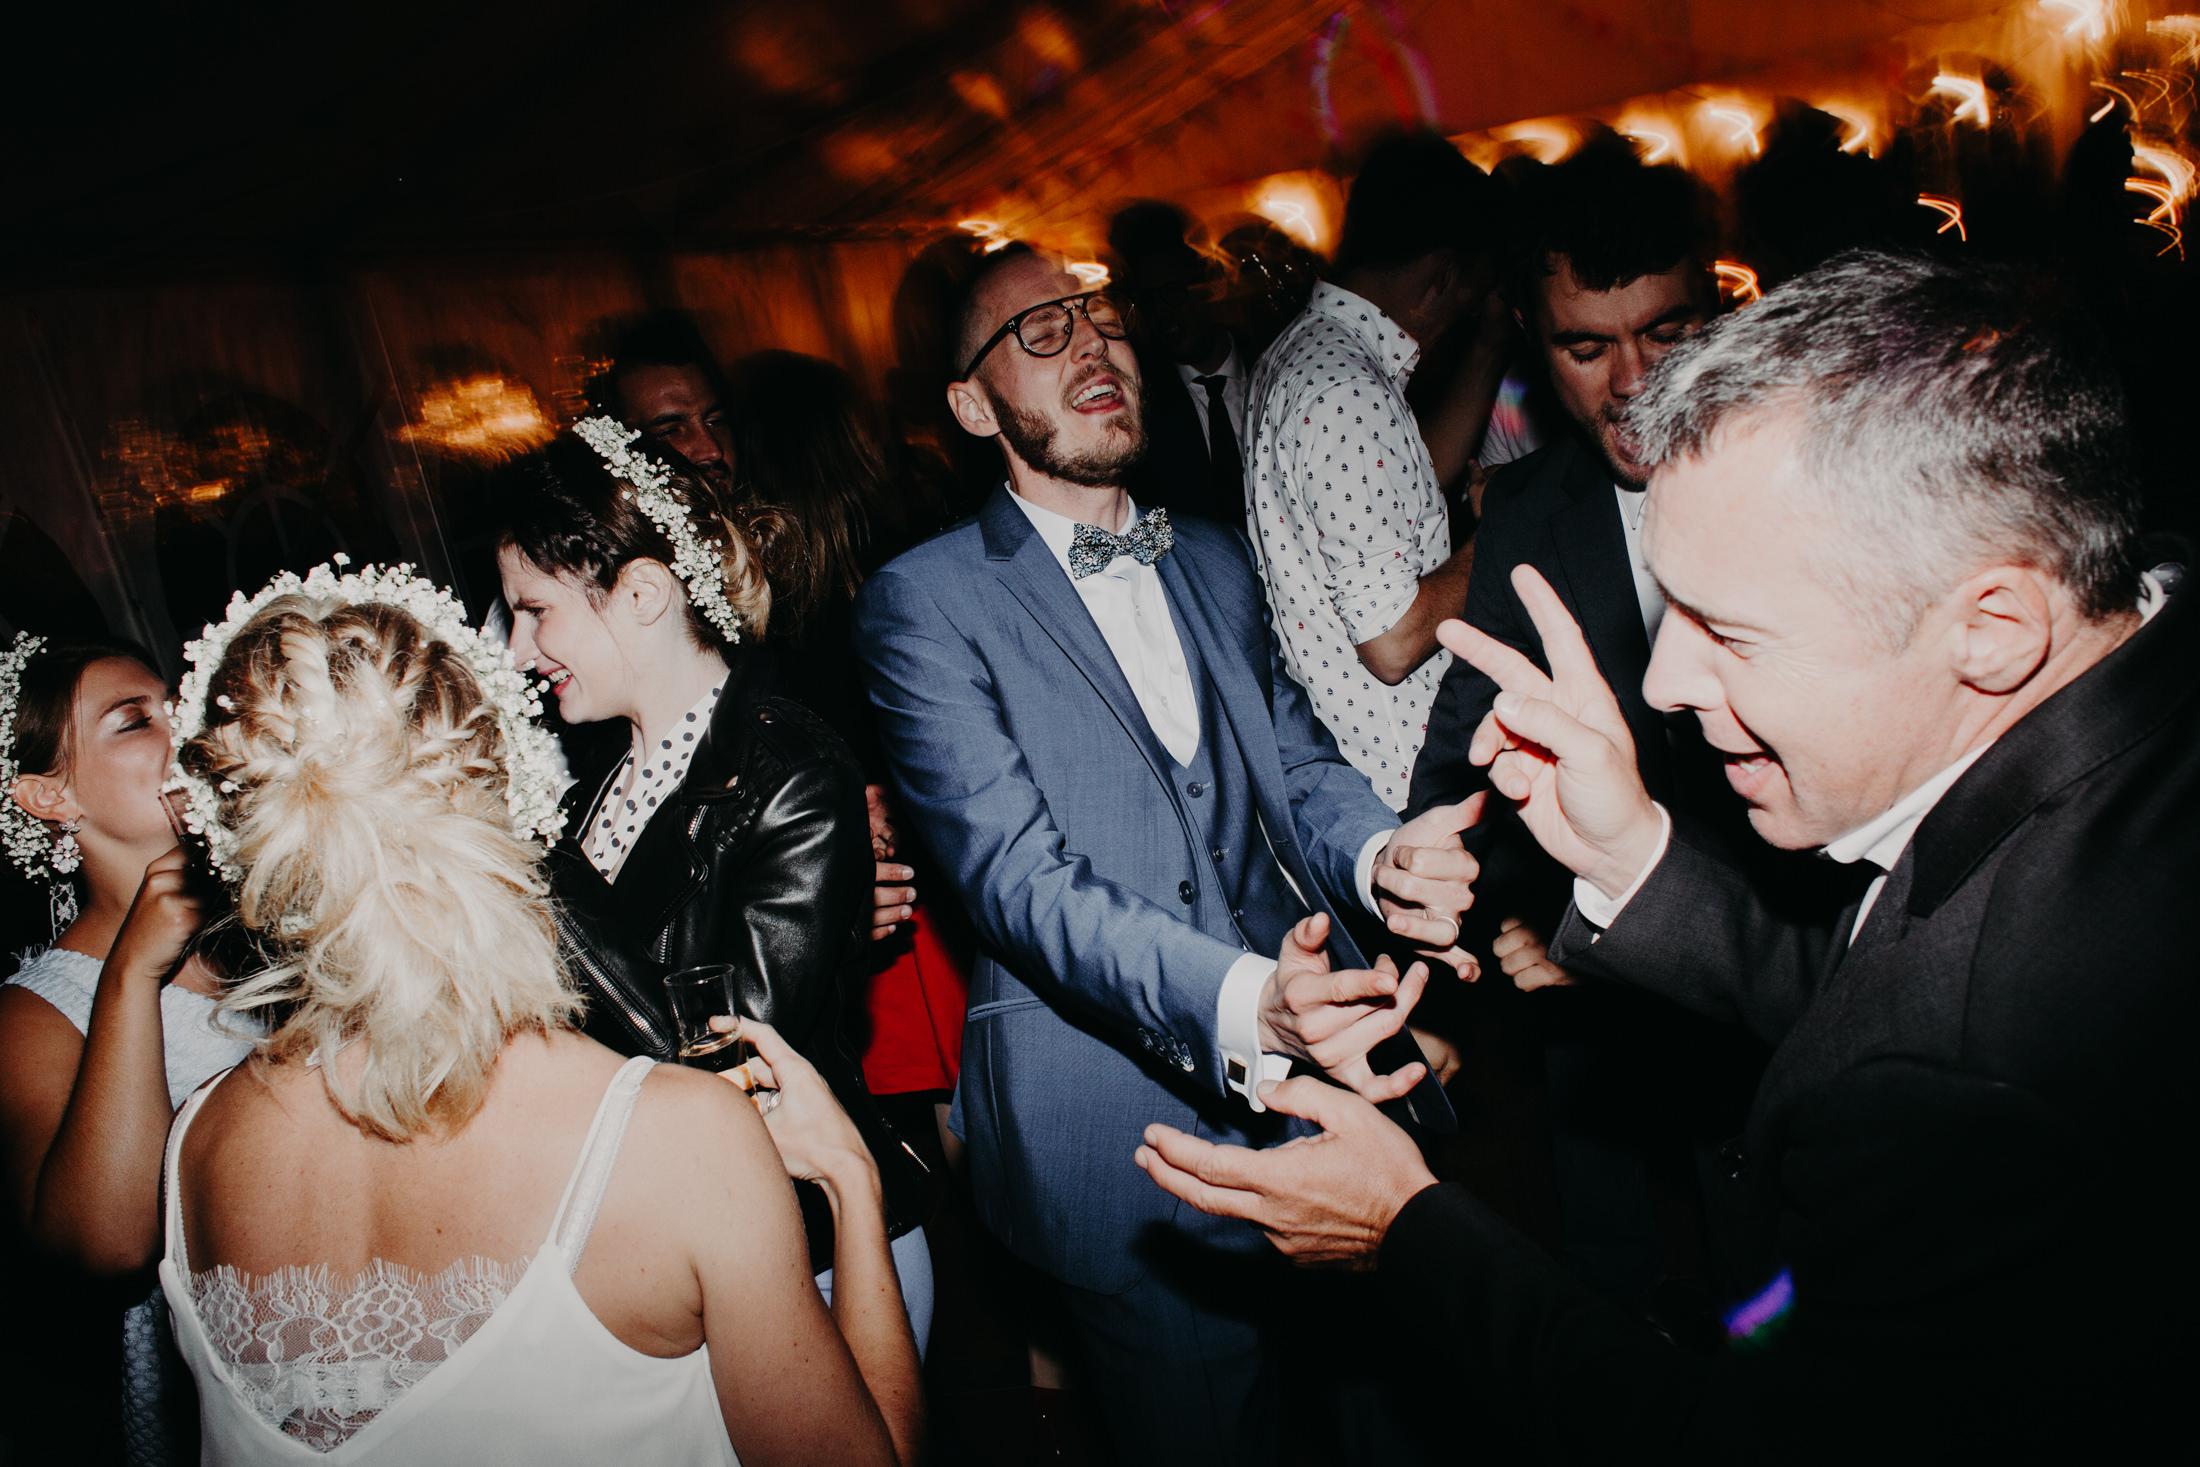 Mariage alsace germany wedding kid-76.jpg